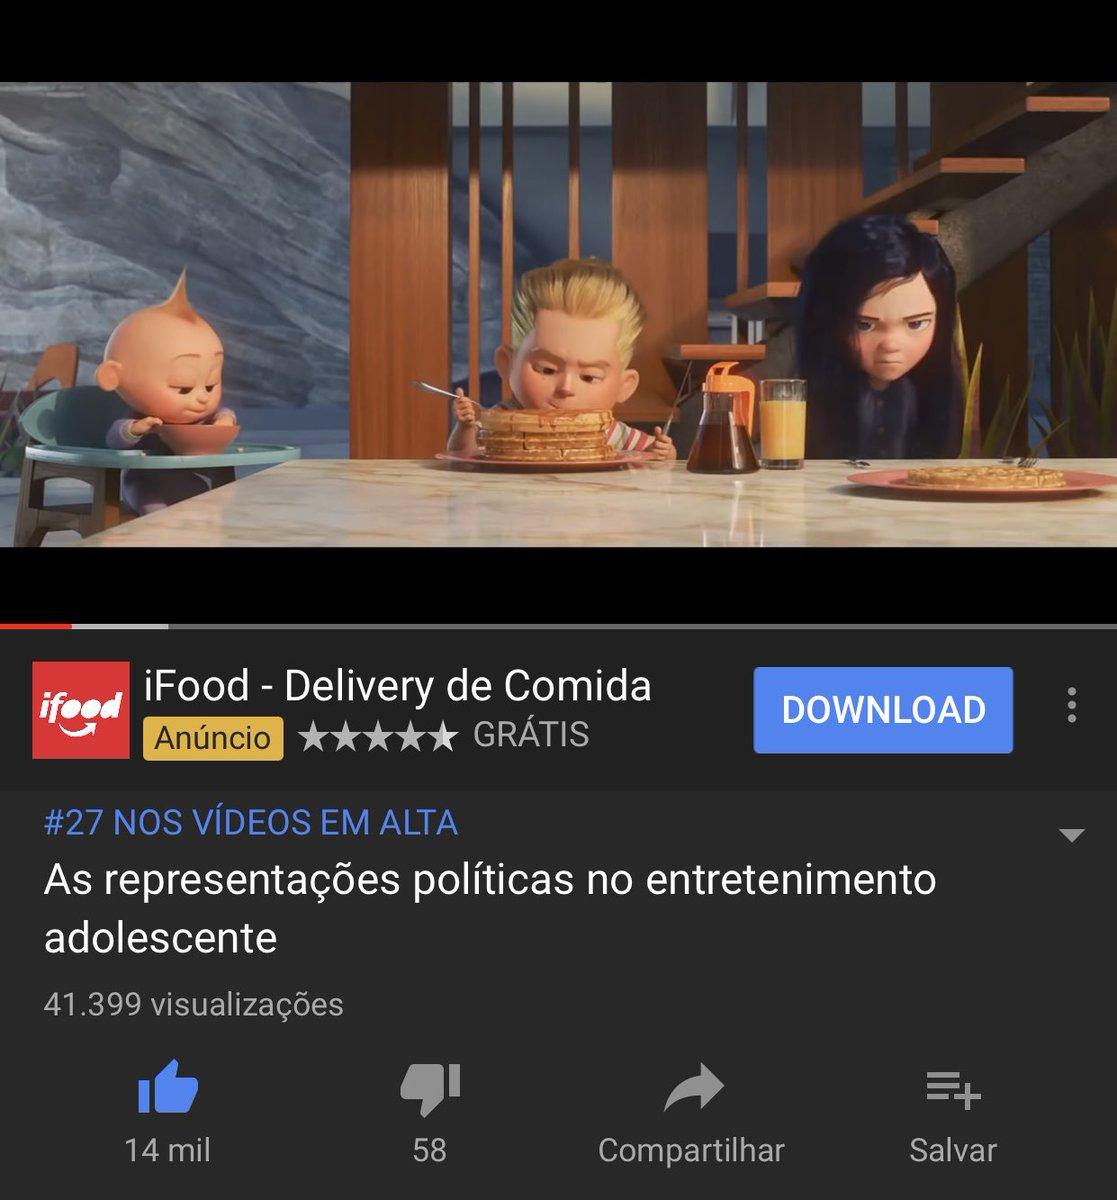 FURACAO CPI DA BAIXAR DA GRATIS VIDEO